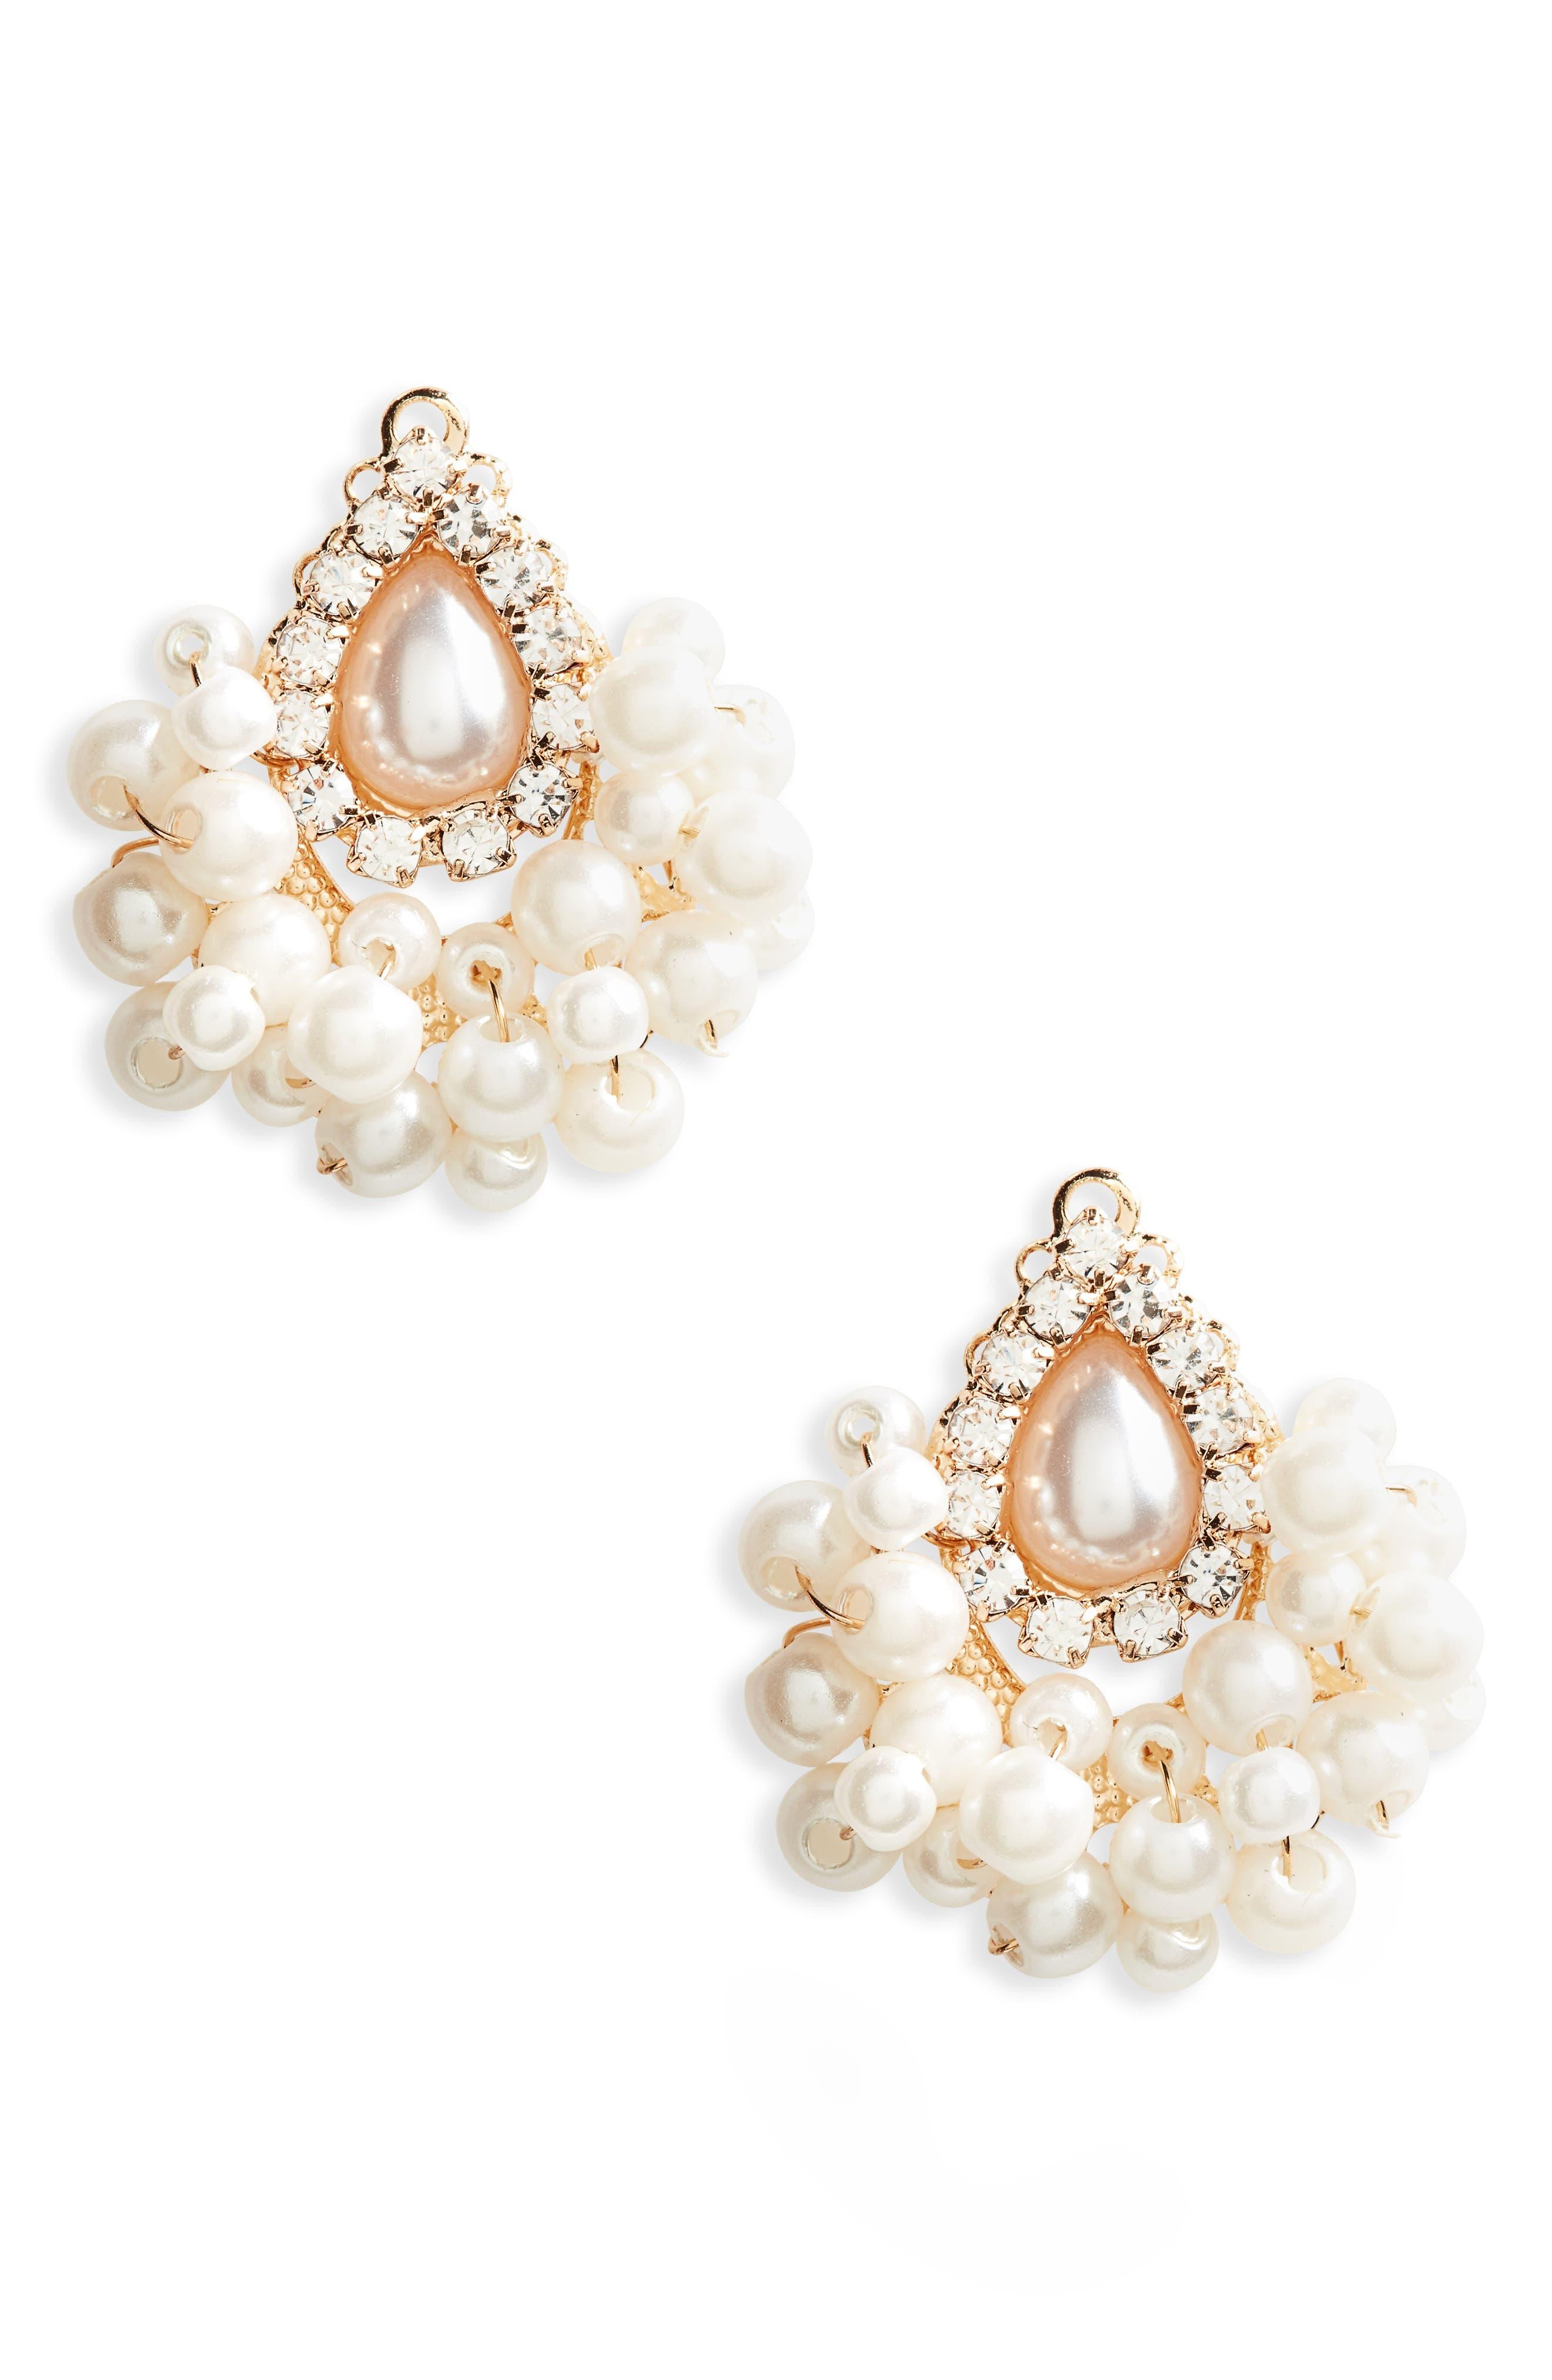 Imitation Pearl Cluster Earrings,                             Main thumbnail 1, color,                             710